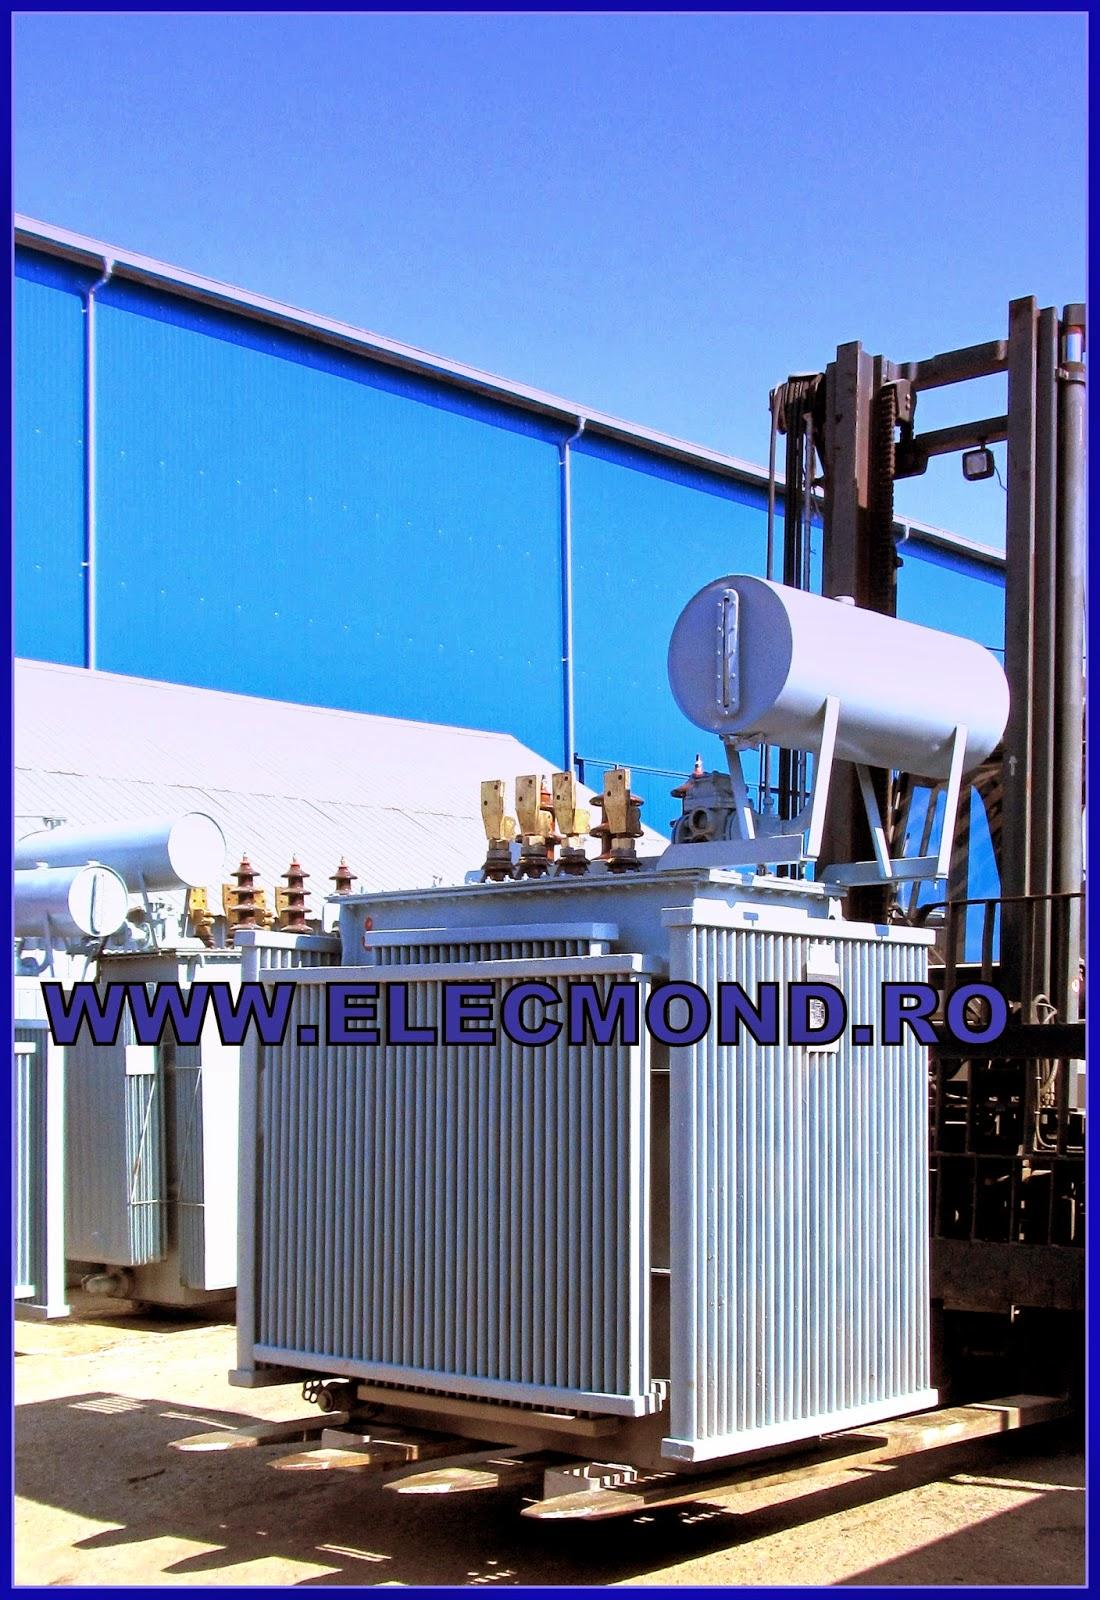 Transformatoare , transformator 1000 kVA transformator 1600 kVA , transformatoare de putere , fabrica transformatoare , reparatii transformatoare , transformator 400 kVA , trafo 1000 , trafo 1600 , trafo 400 kVA , transformator 400 kVA , , elecmond  ,